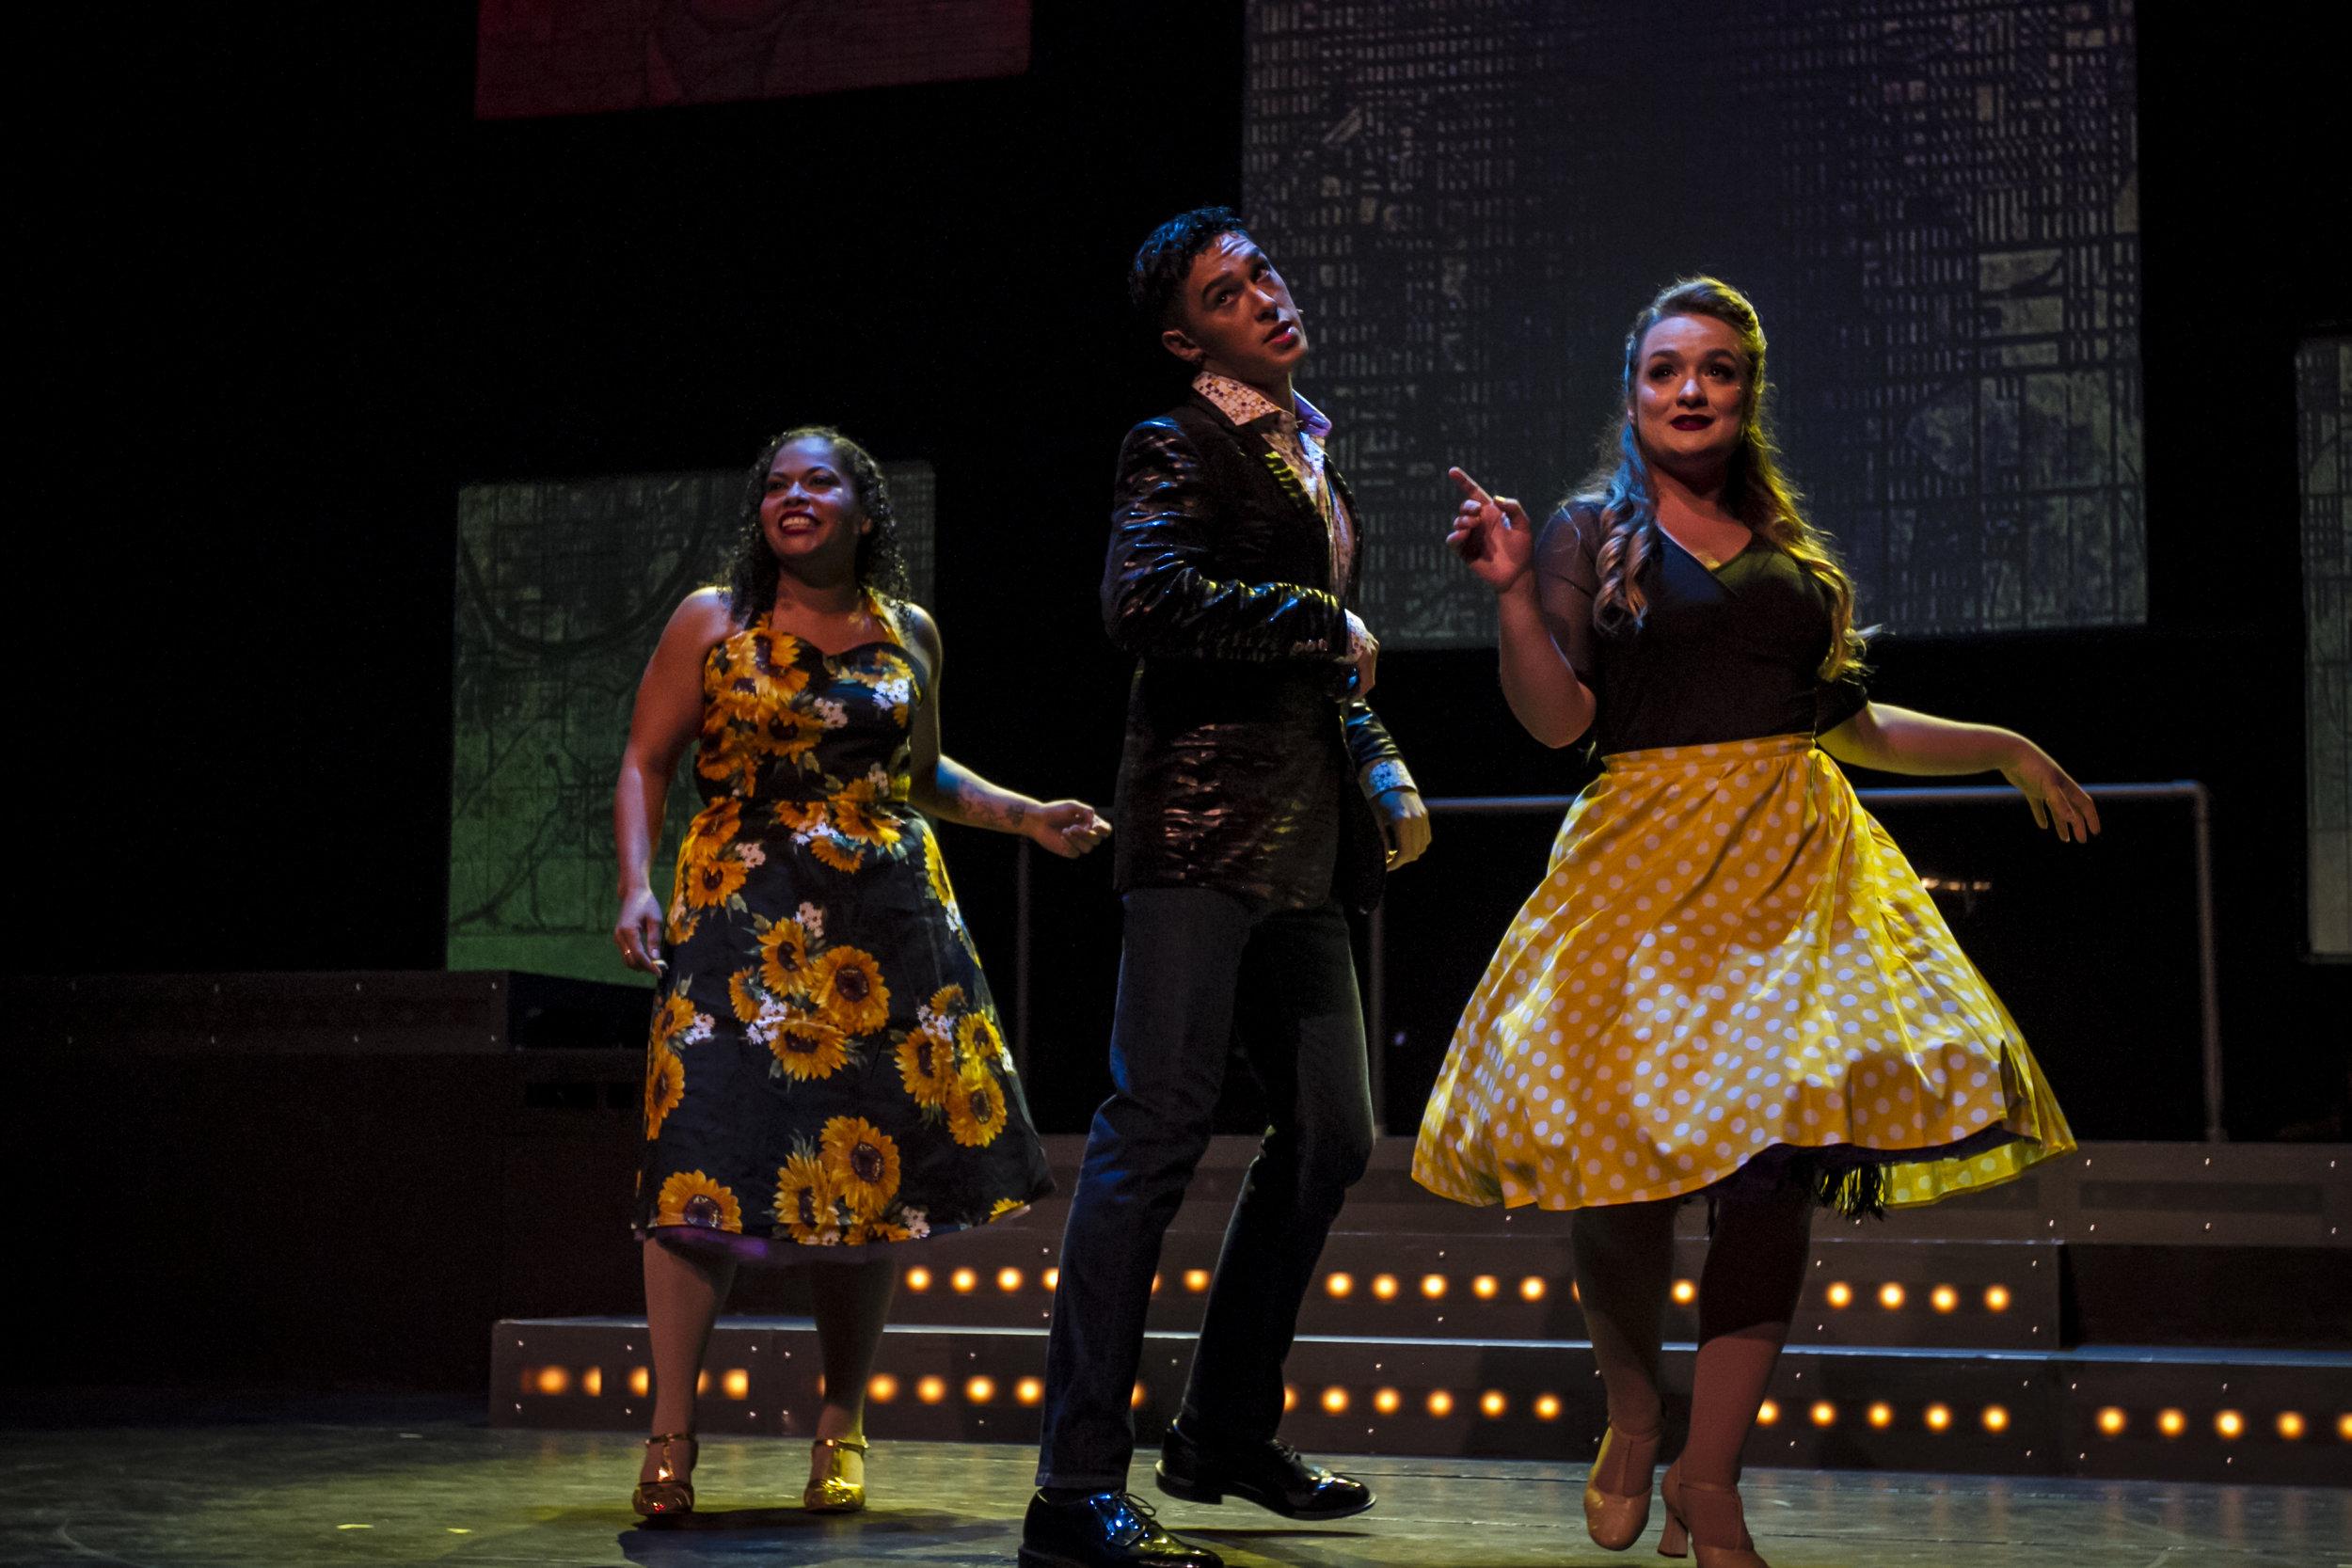 Elizabeth Orellana (left), Kent Navarrette (center) and Serenity Robb (right) performing on stage. By Yasser Marte. Smokey Joe's Cafe Musical. Santa Monica College (SMC) Theater Arts Main Stage. Oct. 2, 2018 ( Yasser Marte/Corsair Staff)